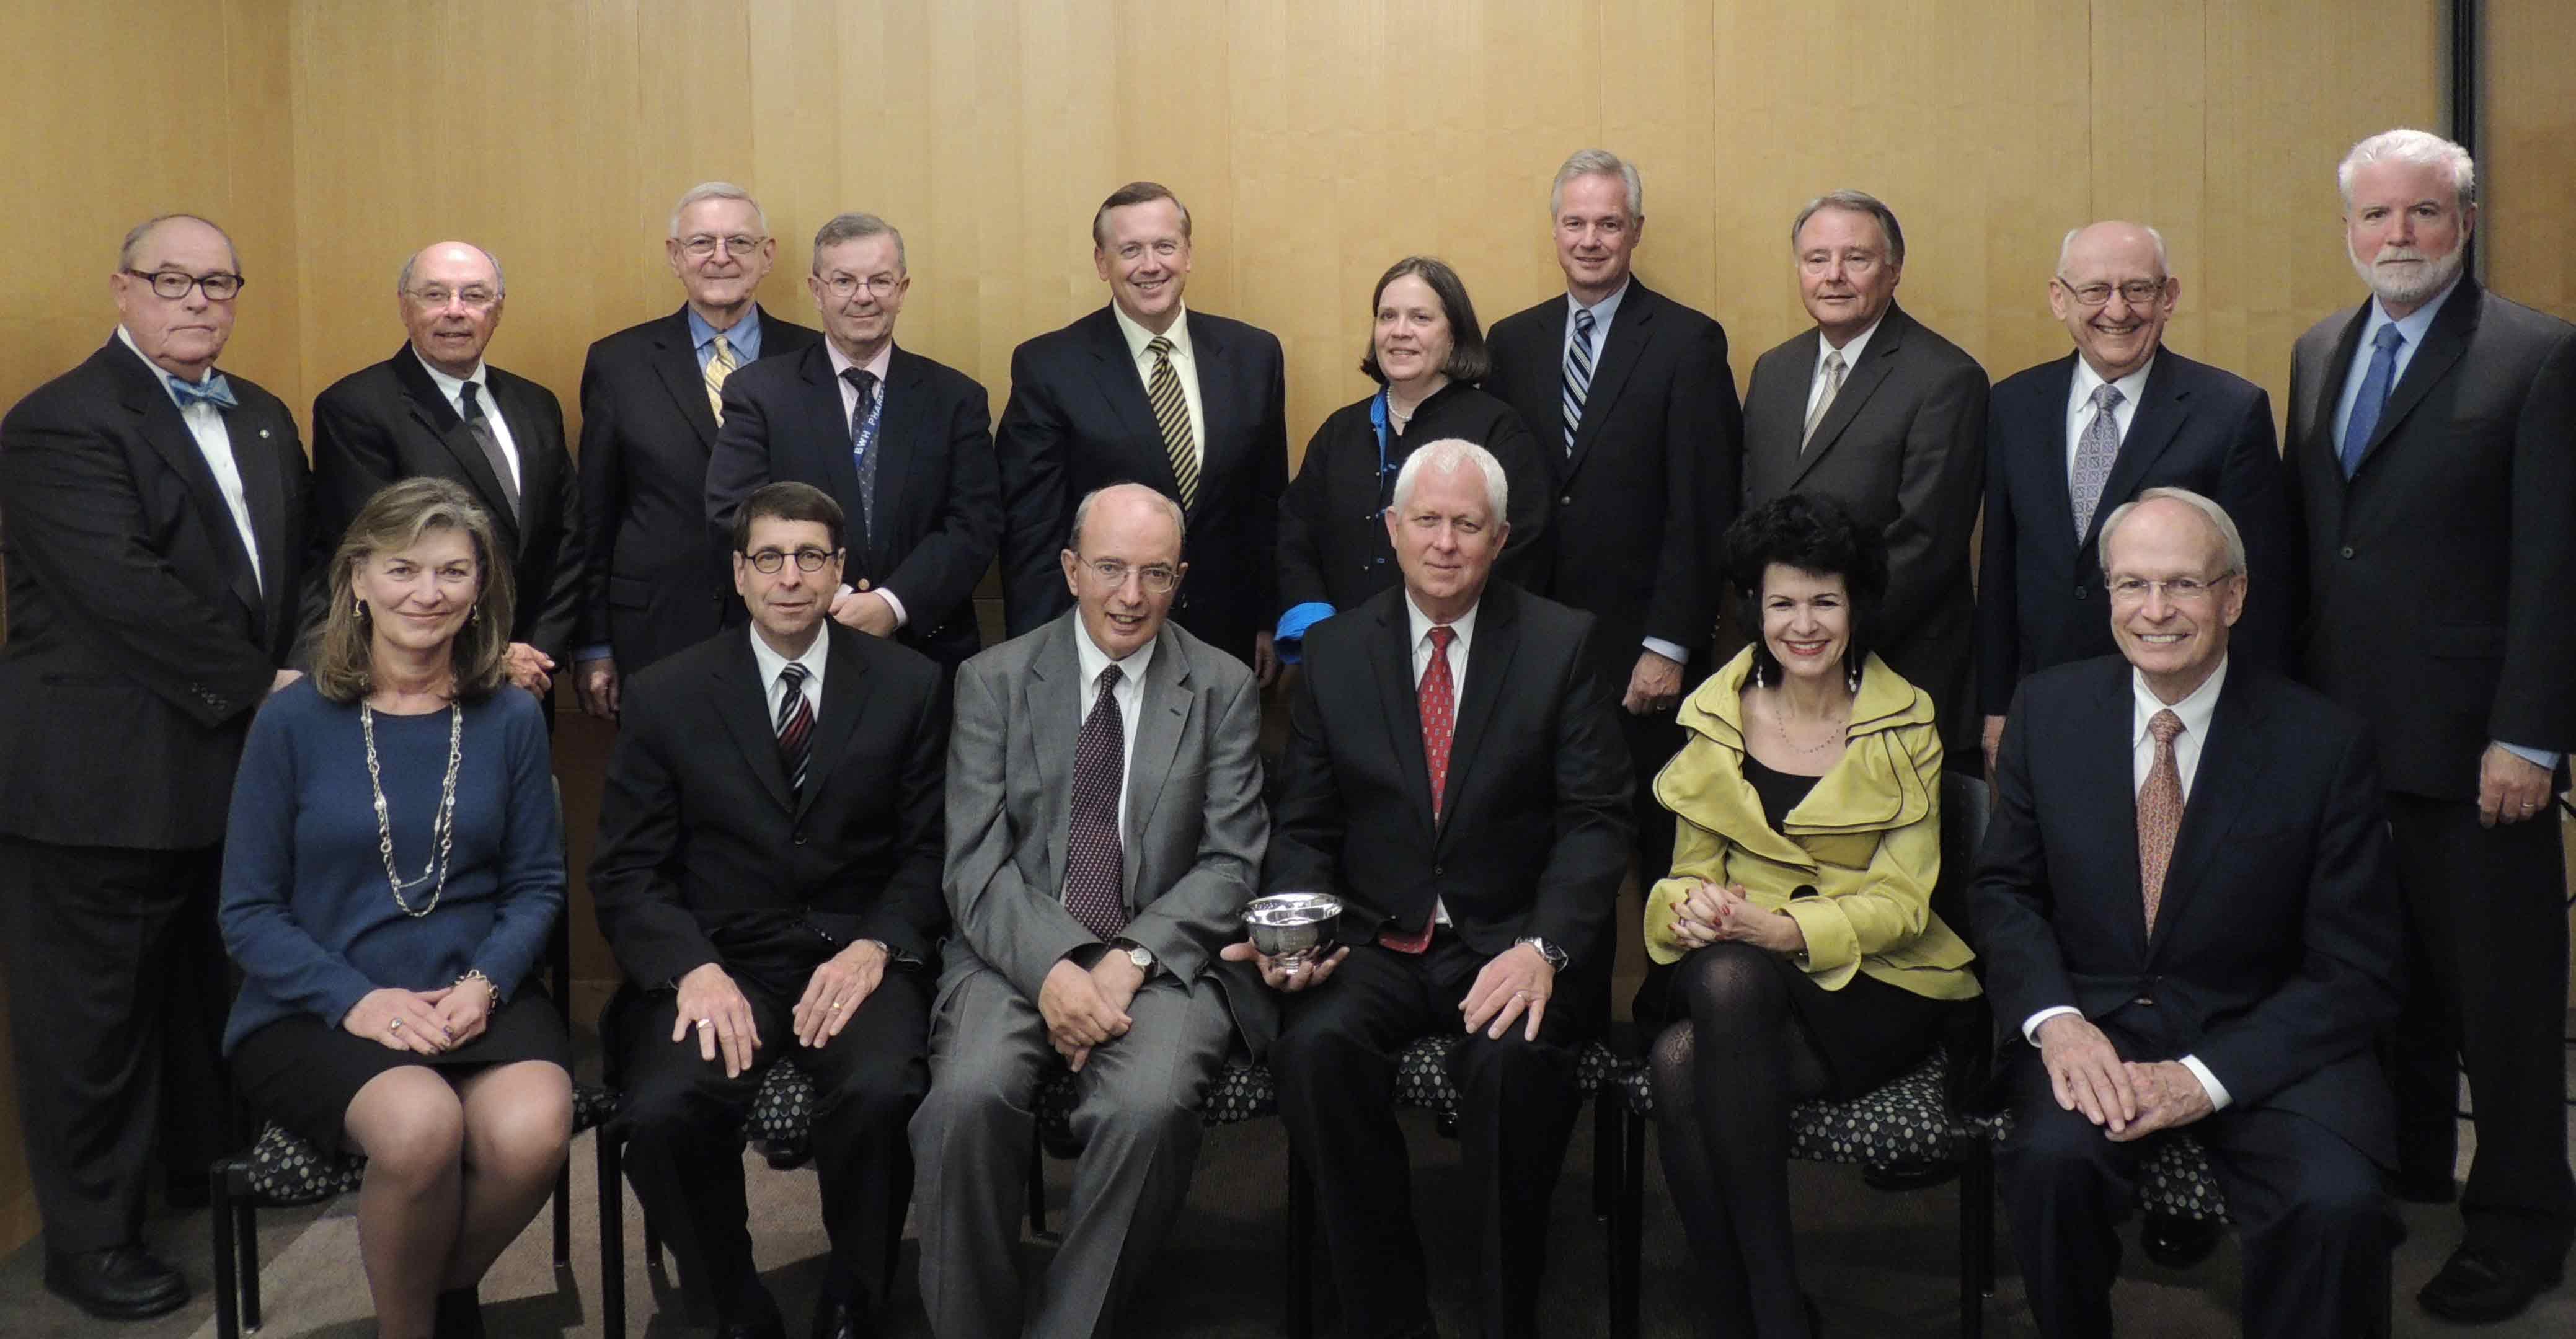 2014 Webb Past Lecturers